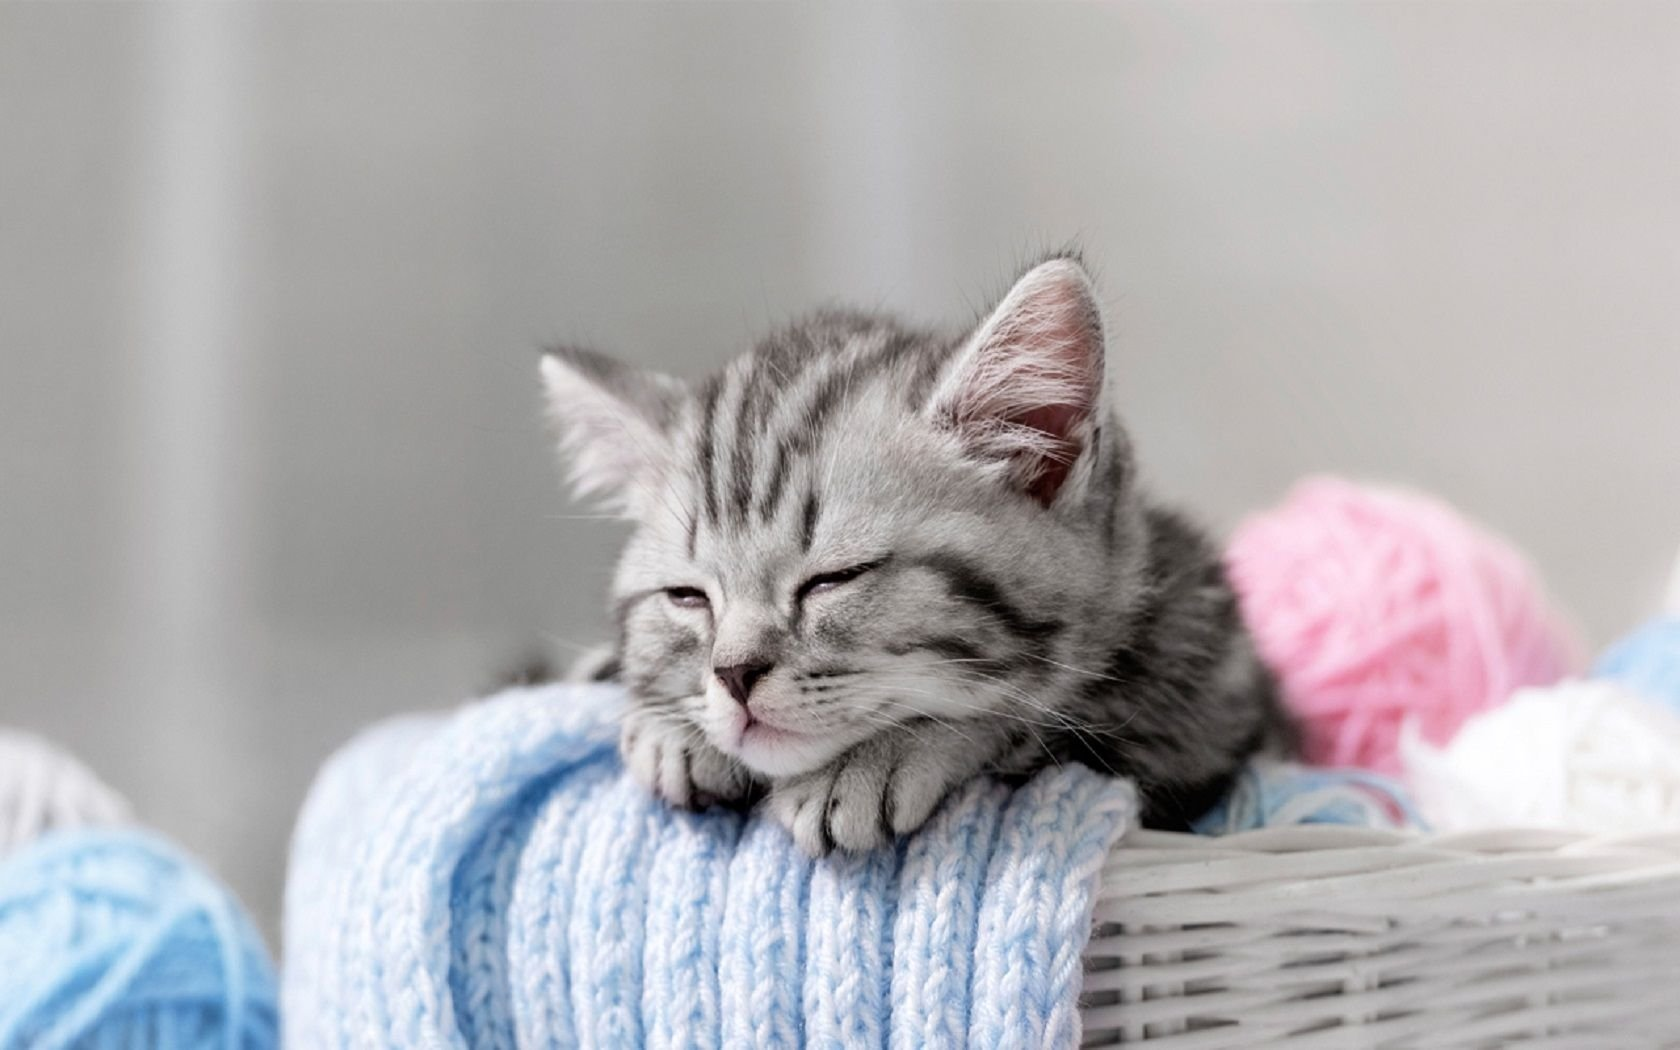 Cute Kittens Wallpaper For Iphone Sleepy Kitten Wallpaper And Background Image 1680x1050